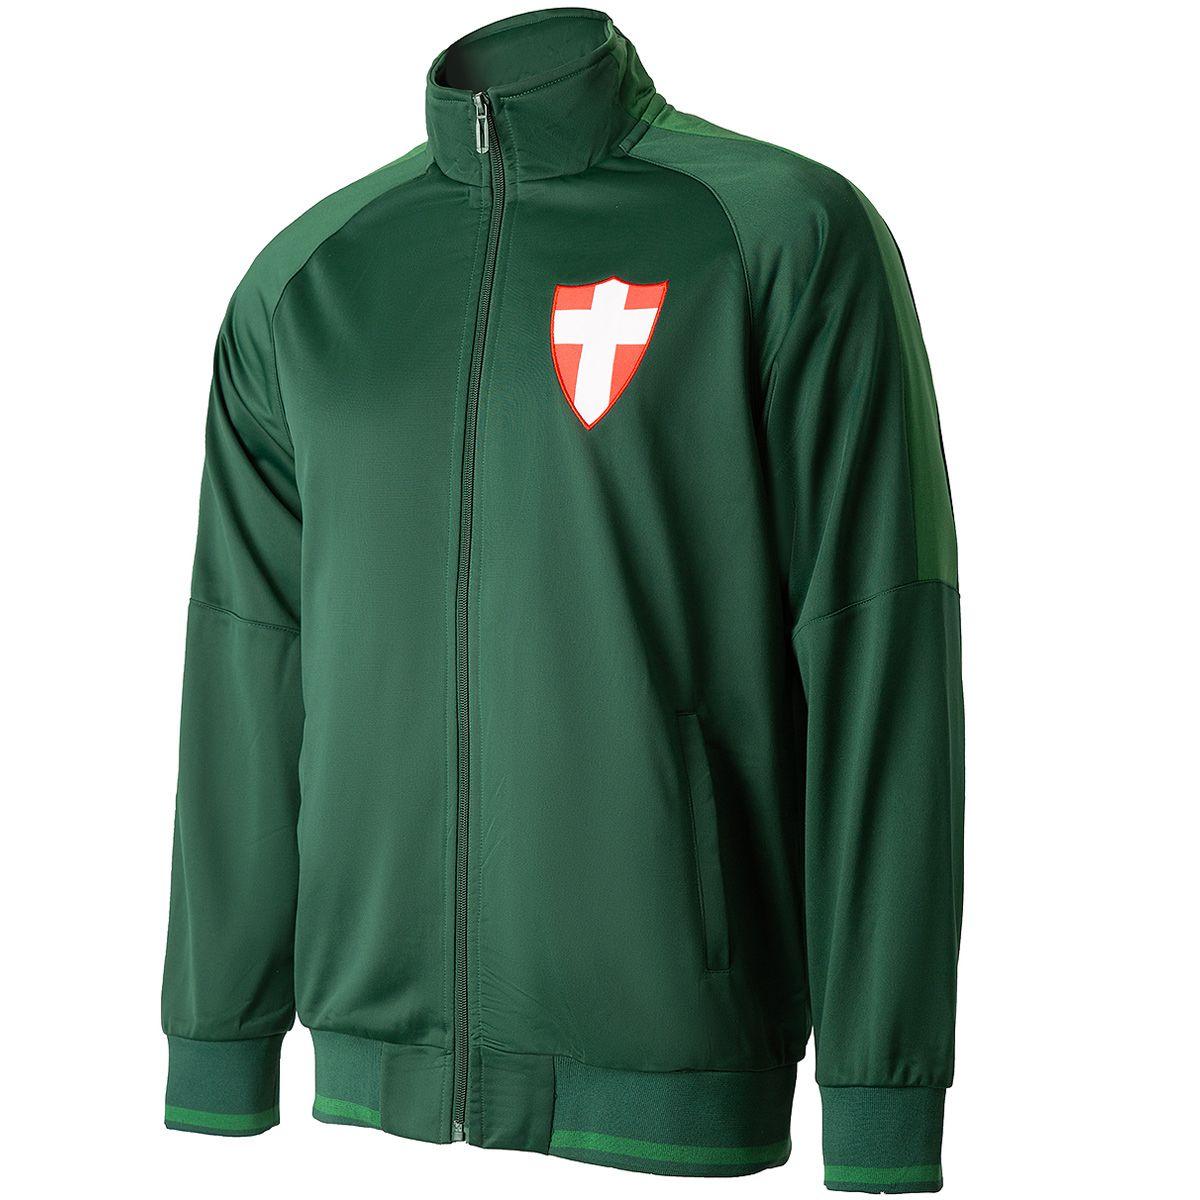 Jaqueta Palmeiras Vintage Savoia Trilobal Verde